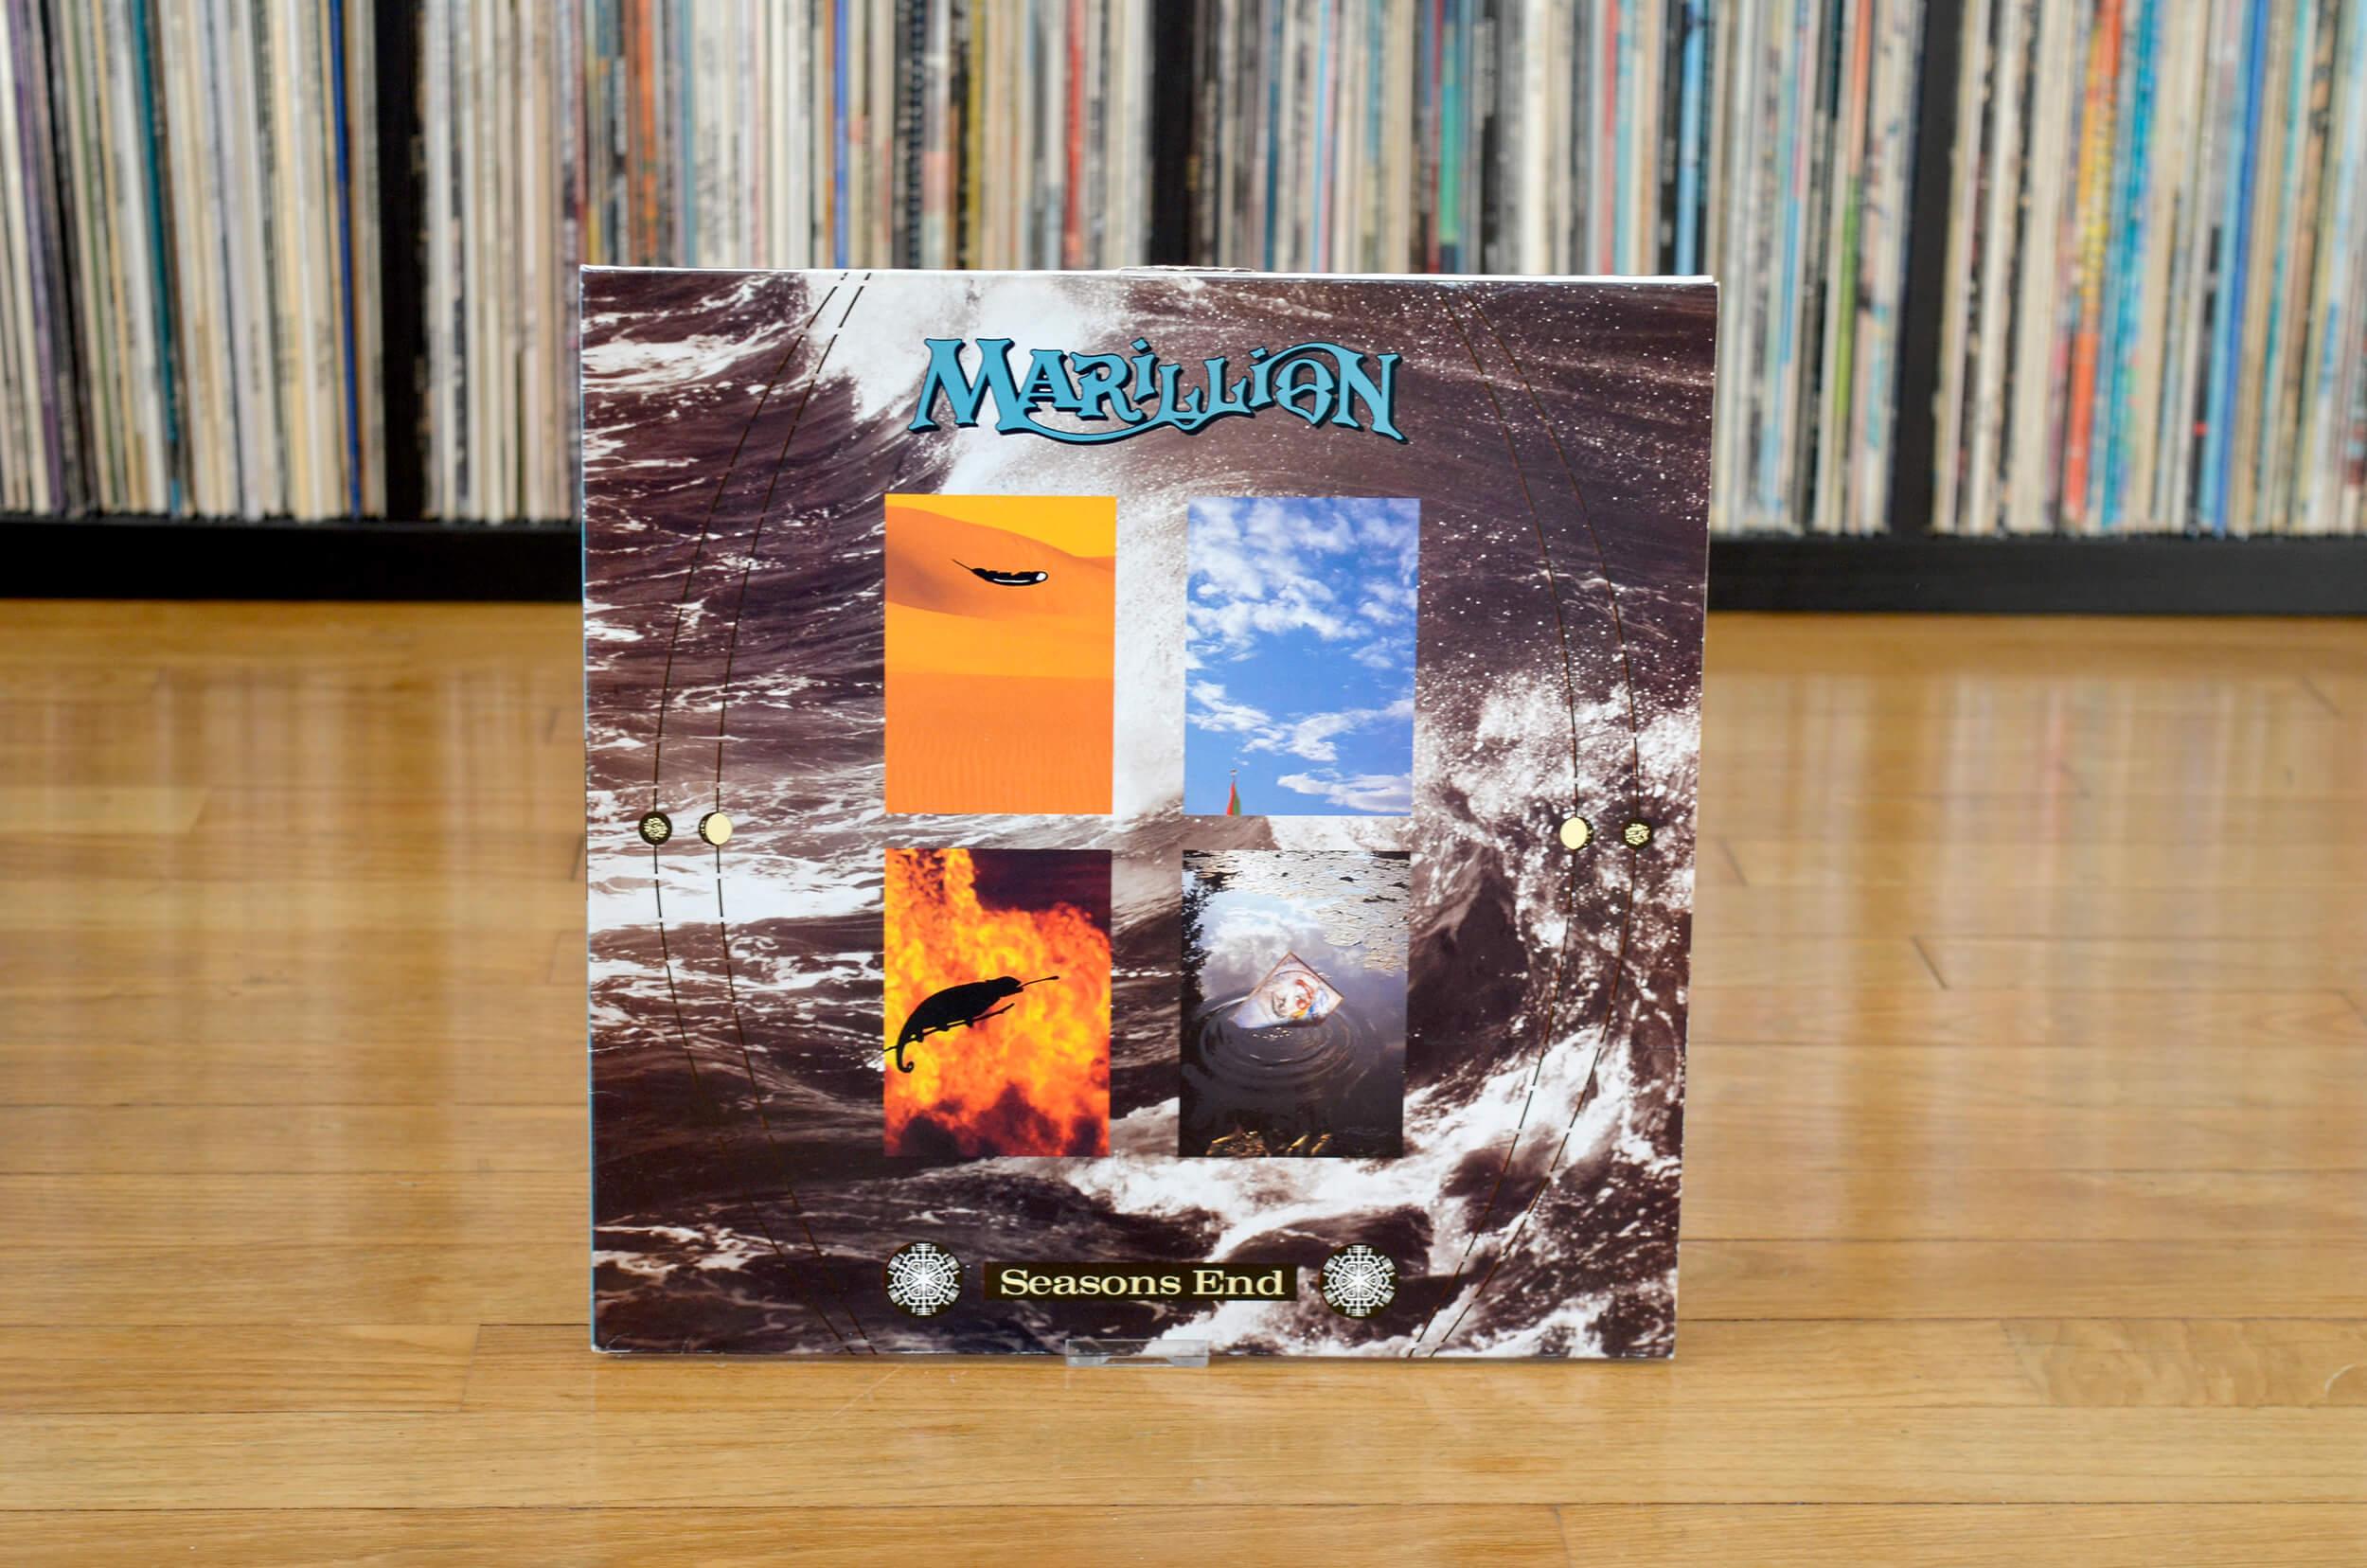 Marillion – Seasons End